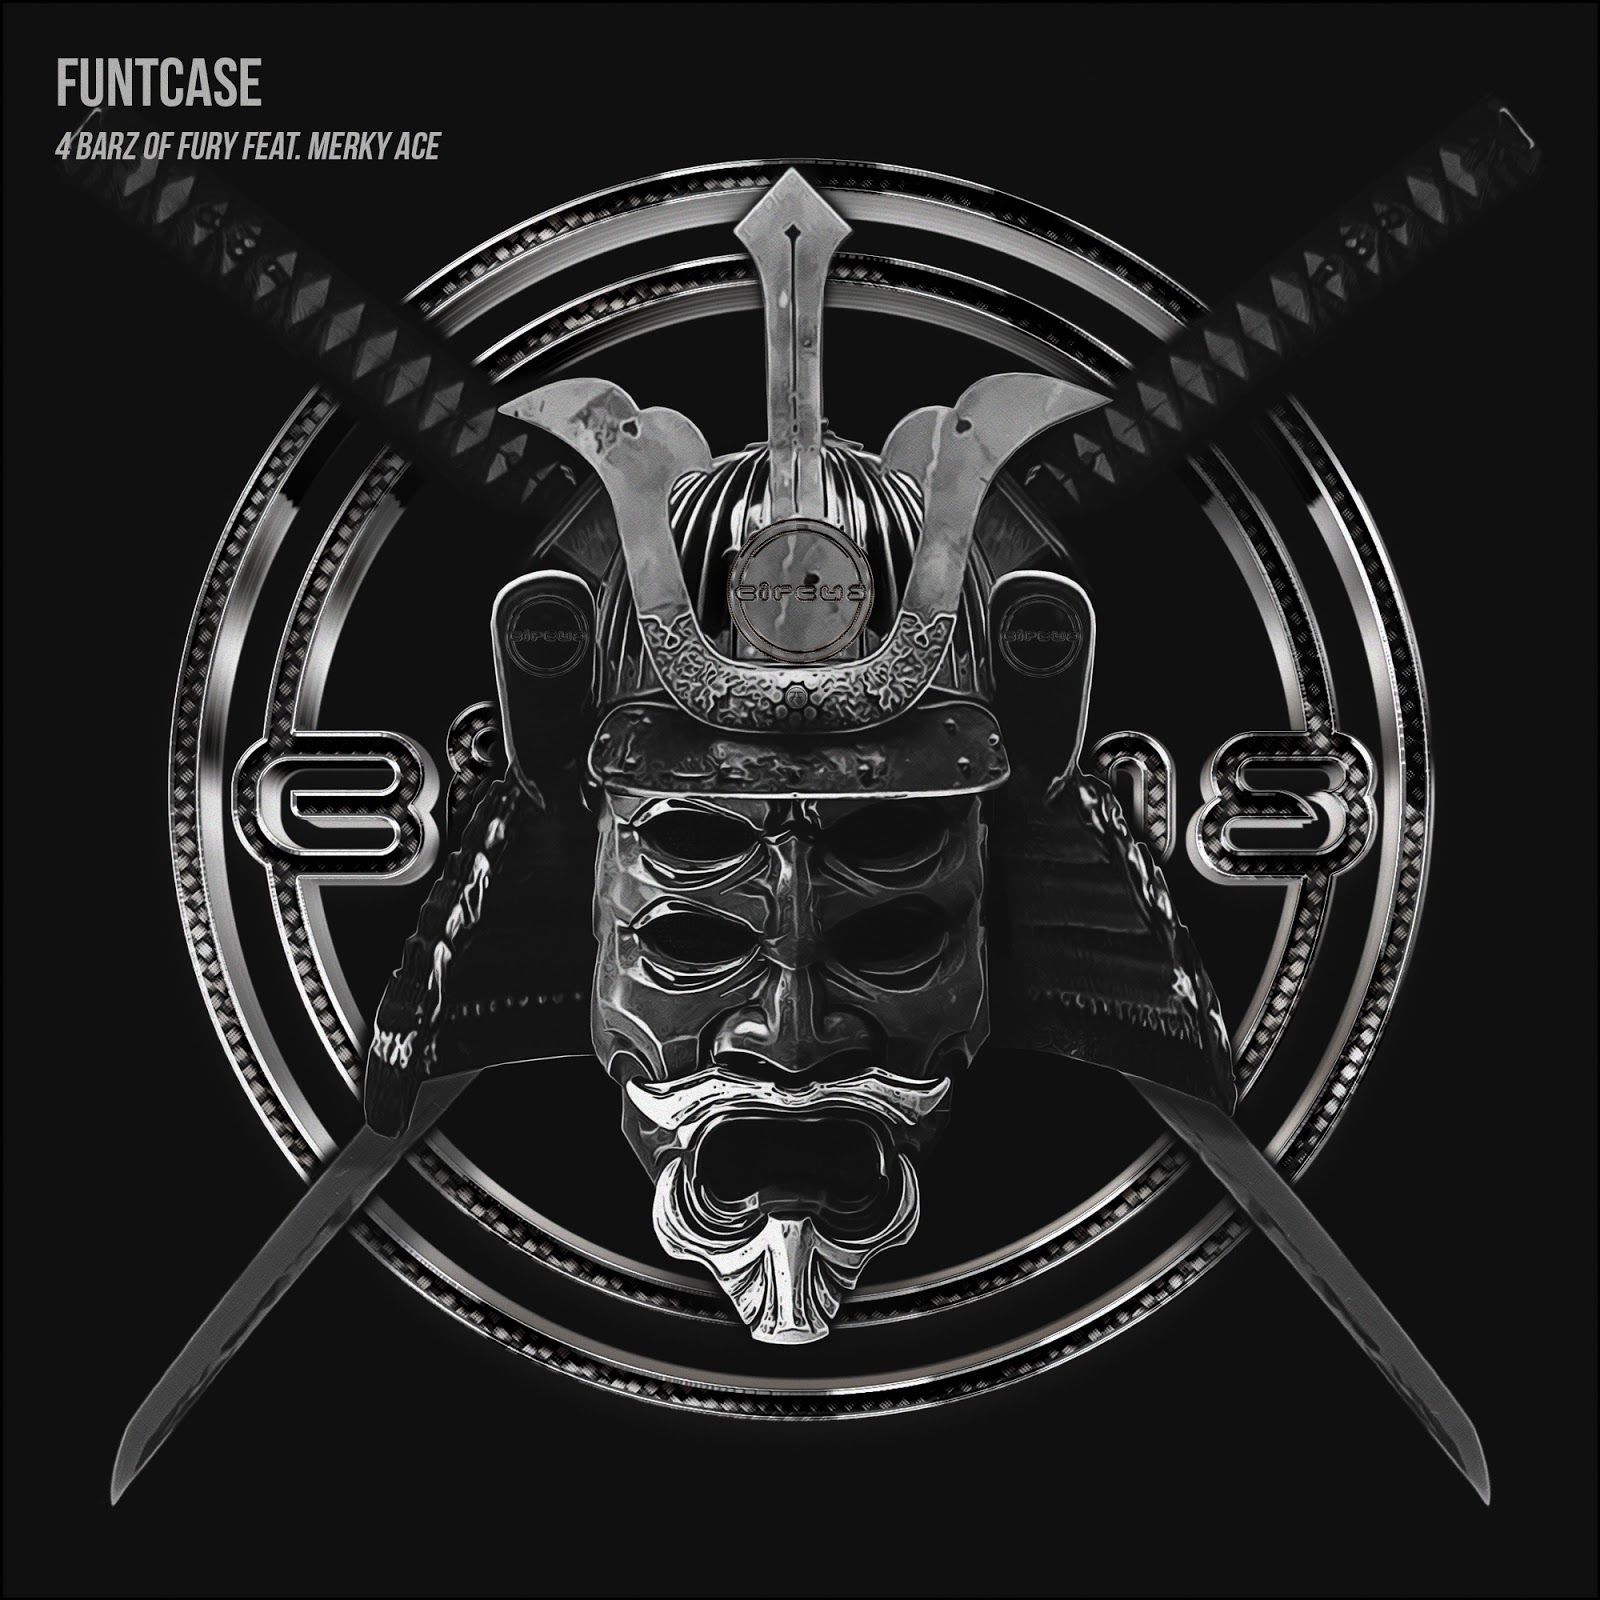 cr085-funtcase-4_barz_of_fury_feat_merky_ace.jpg